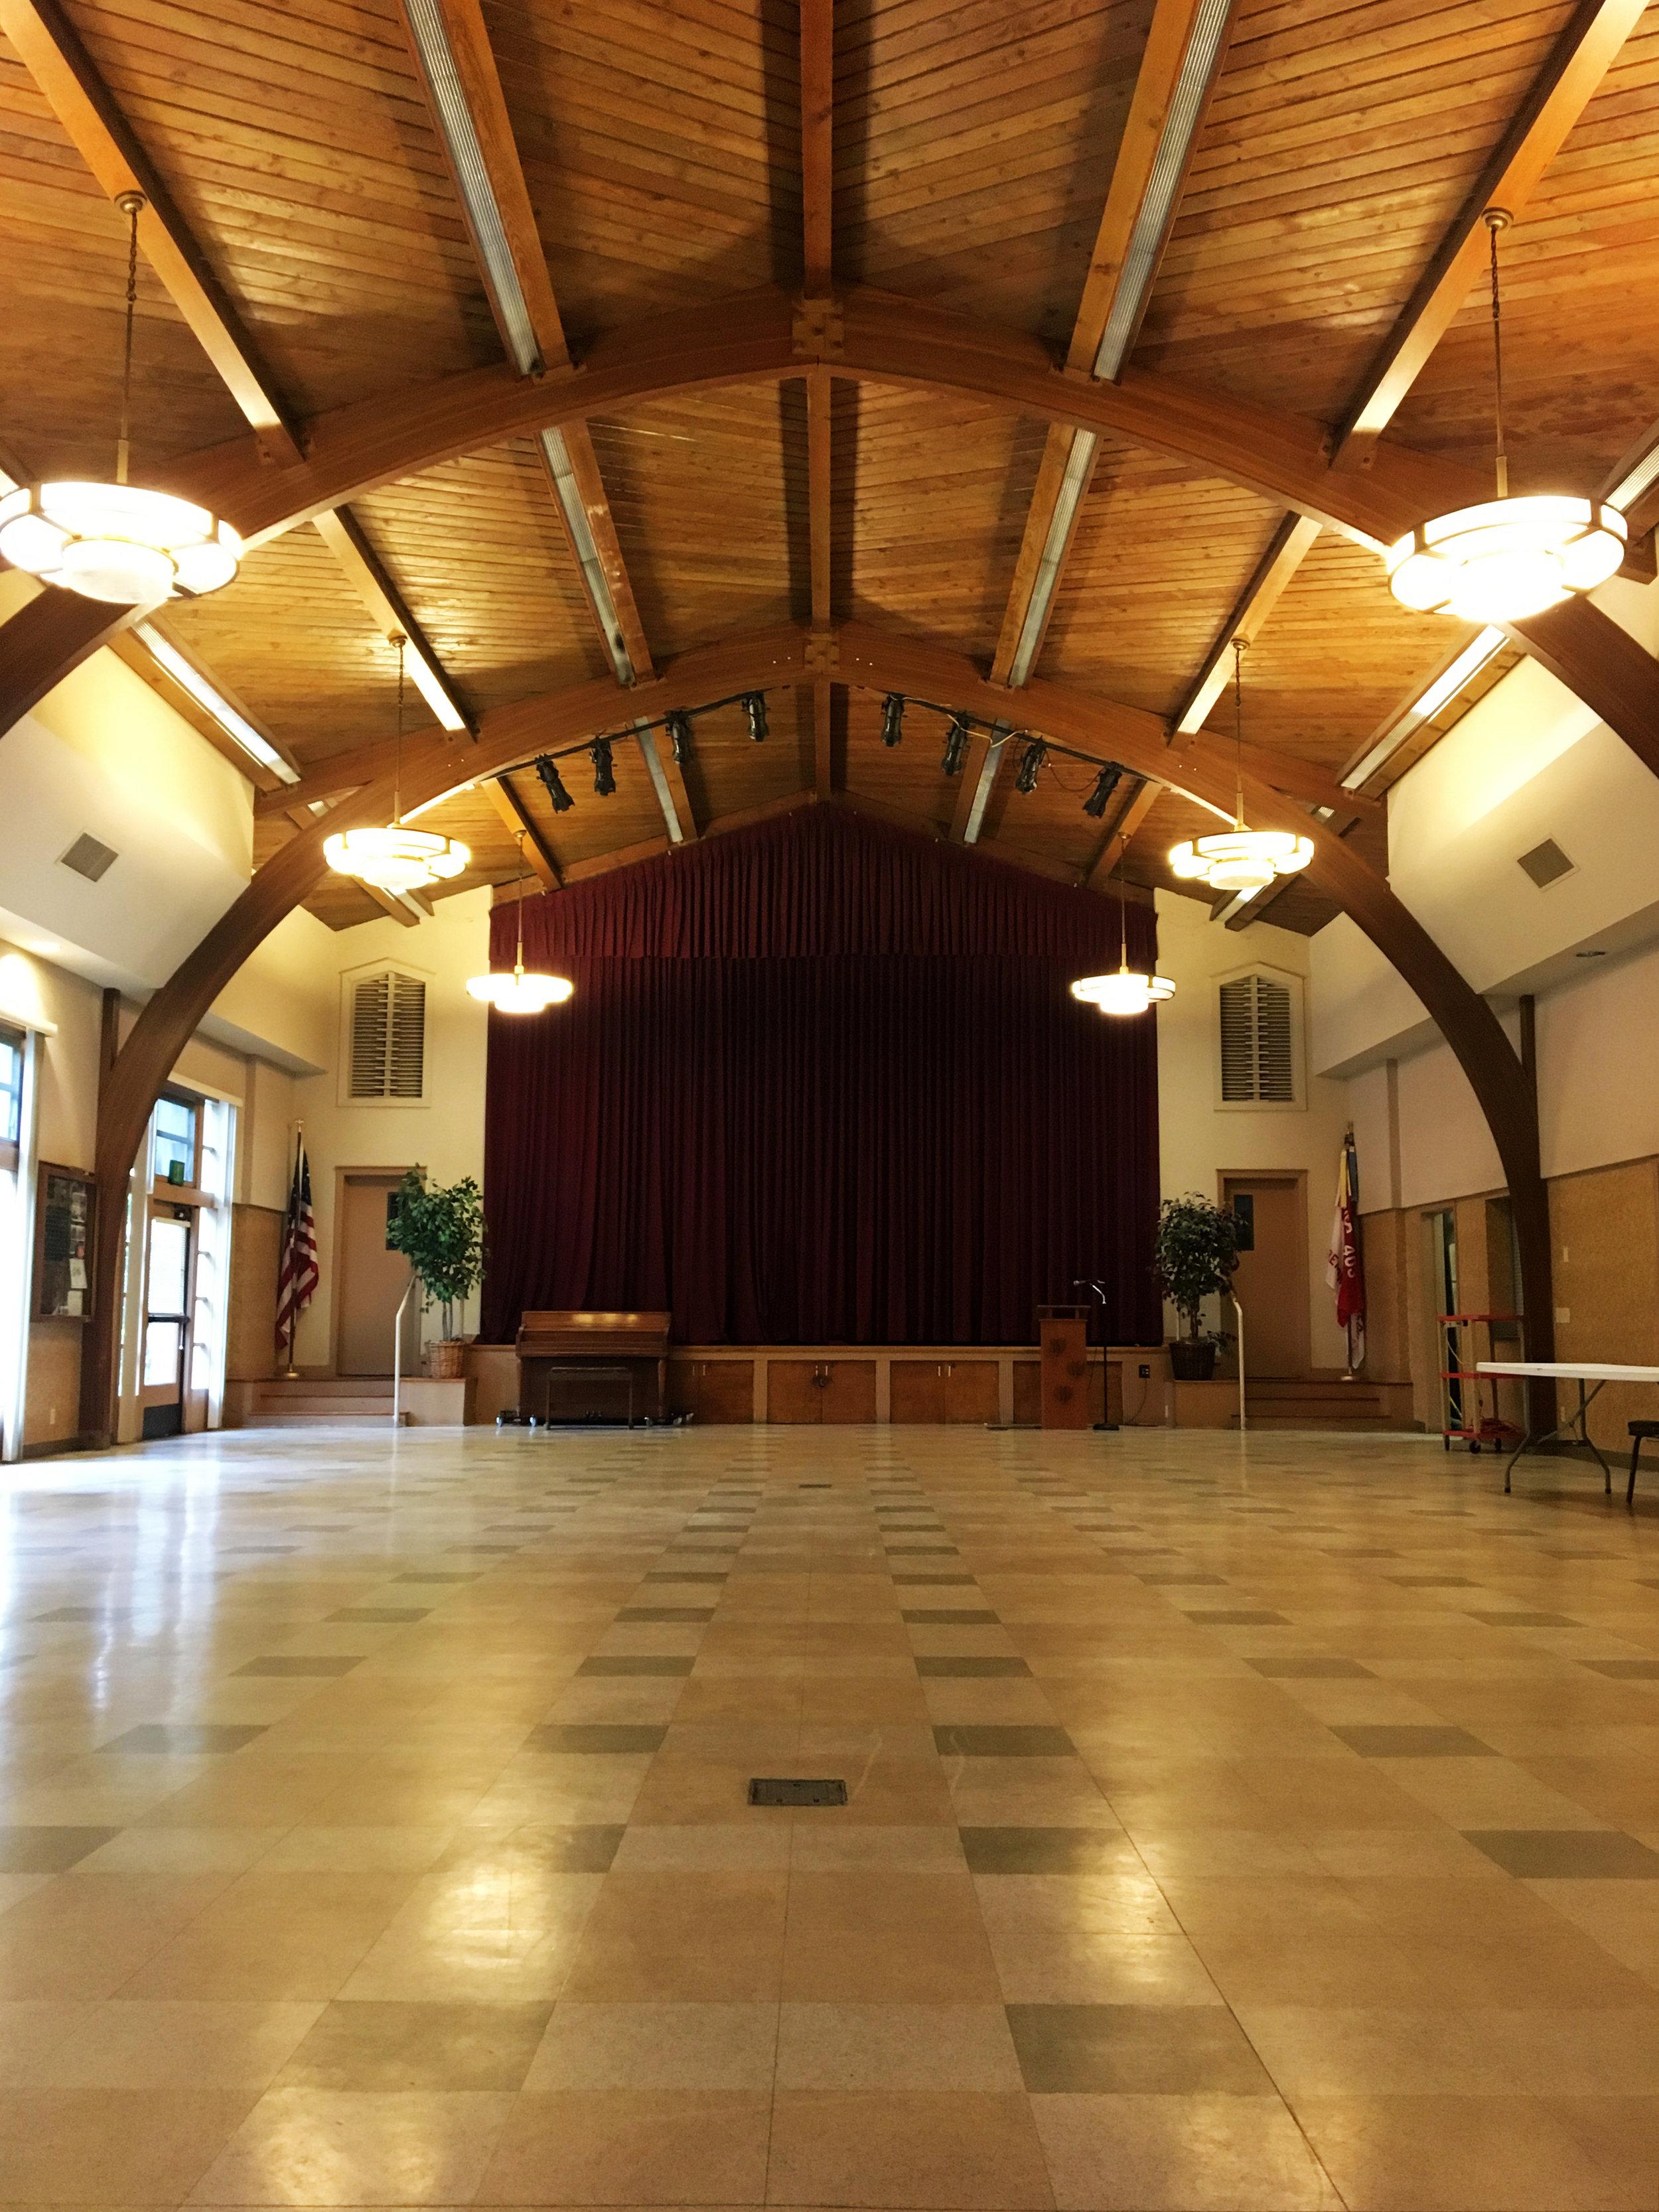 claremont-presbyterian-church-campus-tour-fellowship-hall.jpg